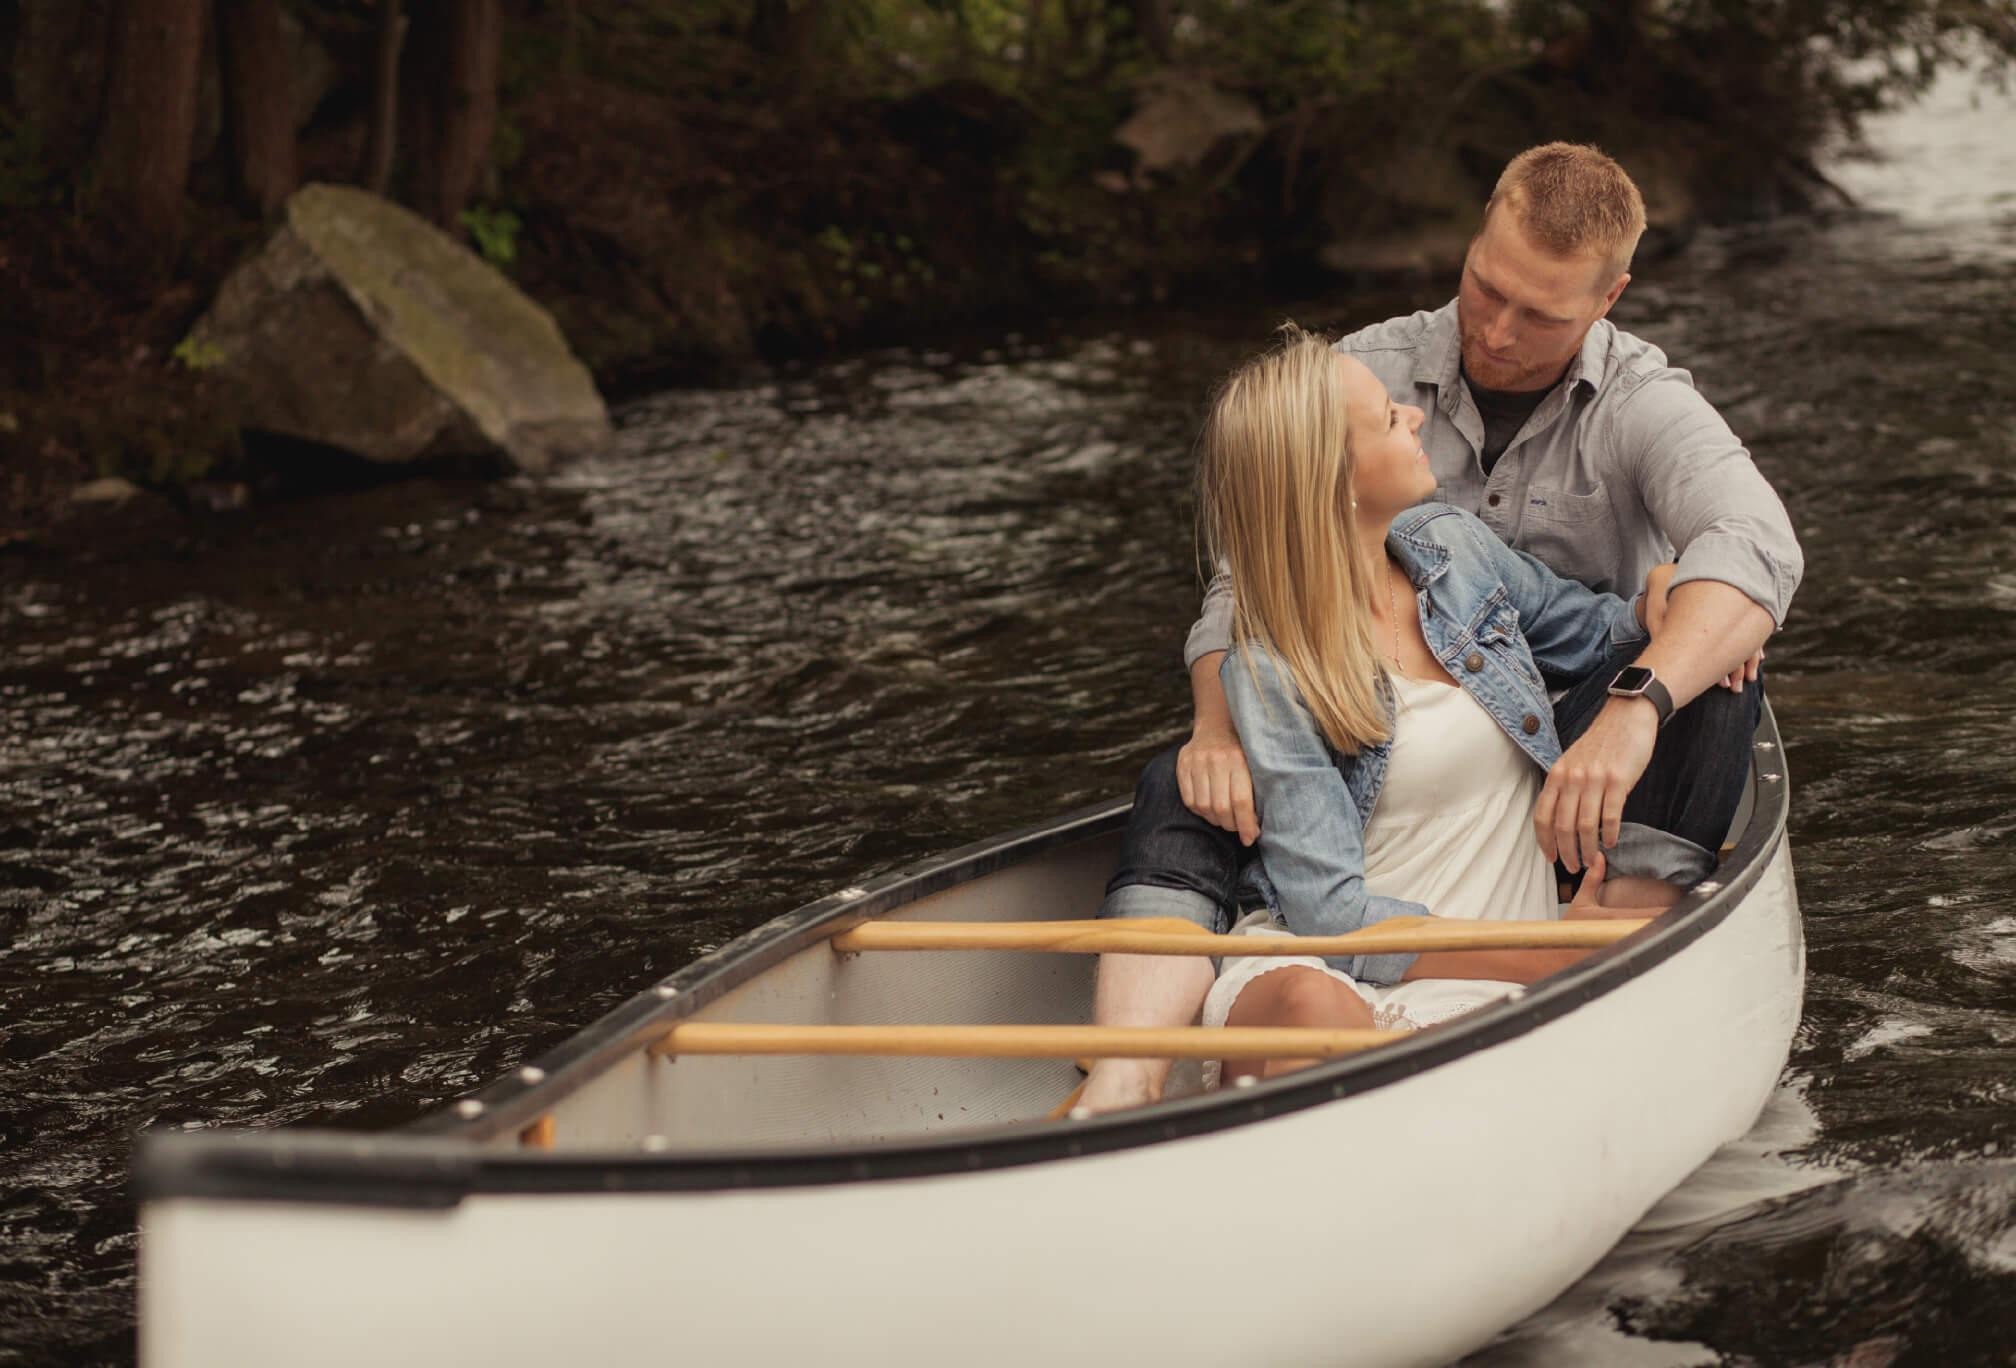 canoe engagement session ideas